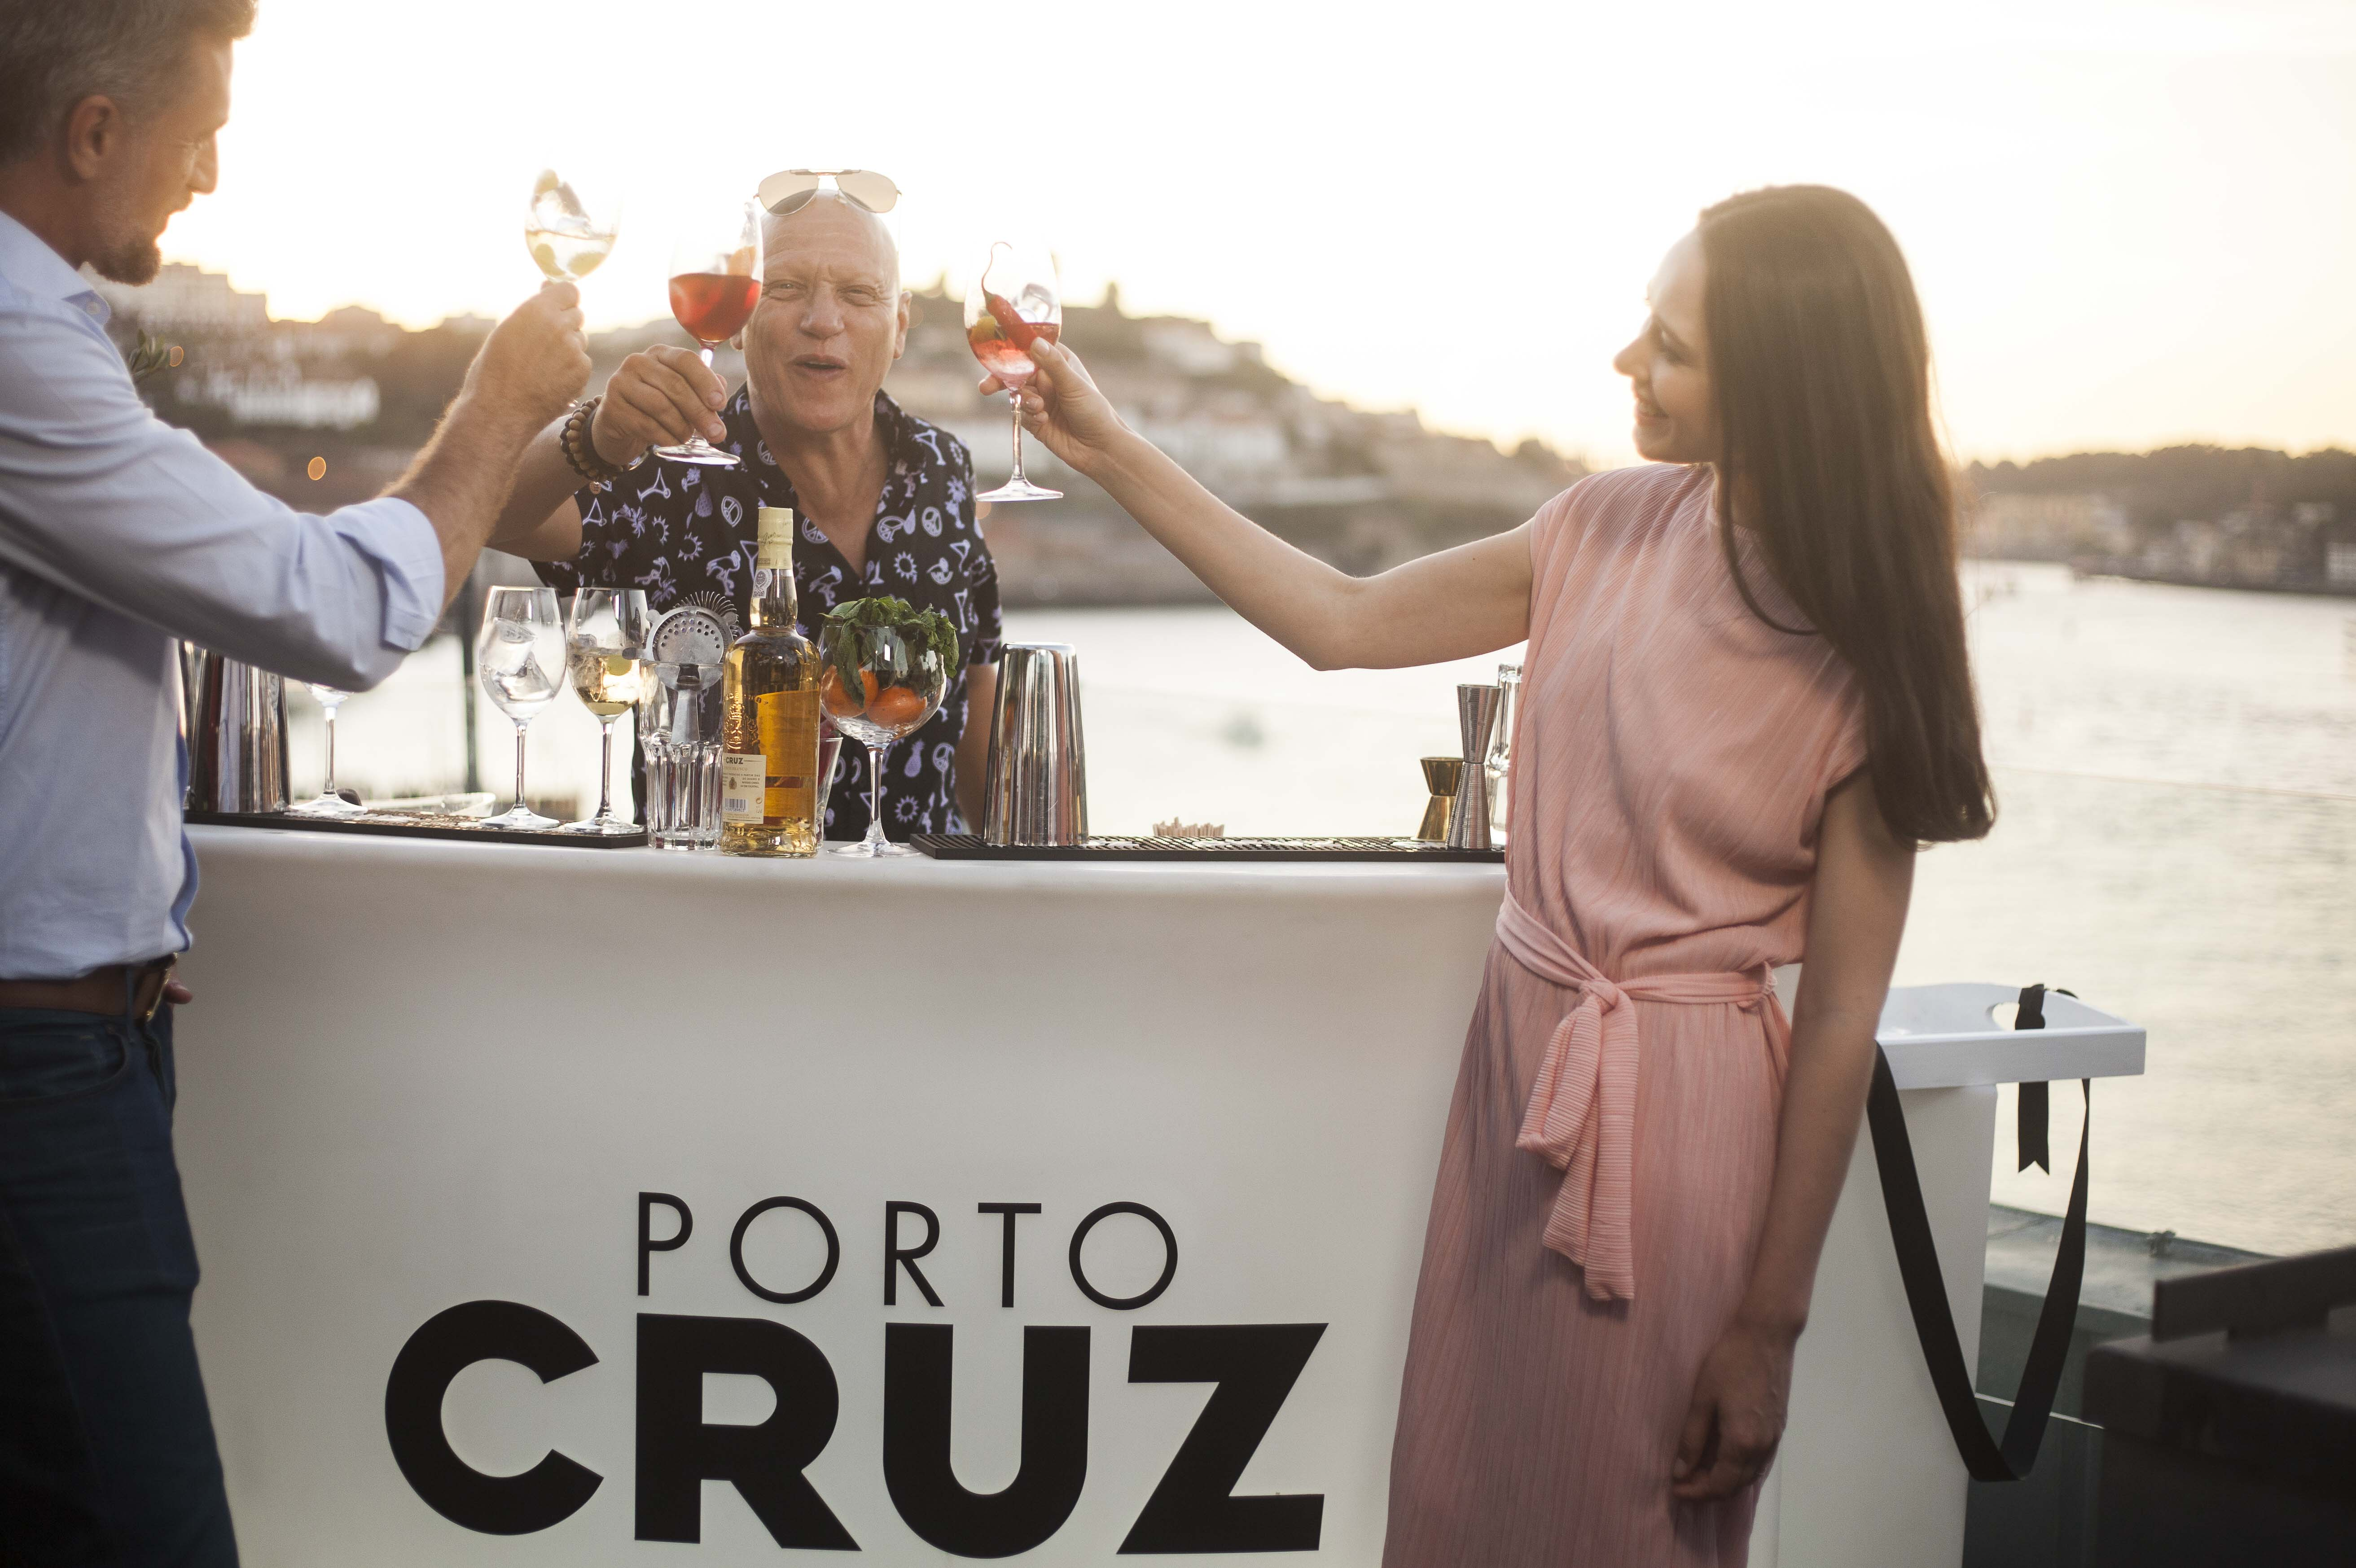 ¡Pase un verano refrescante degustando su Oporto en modo Fresco!